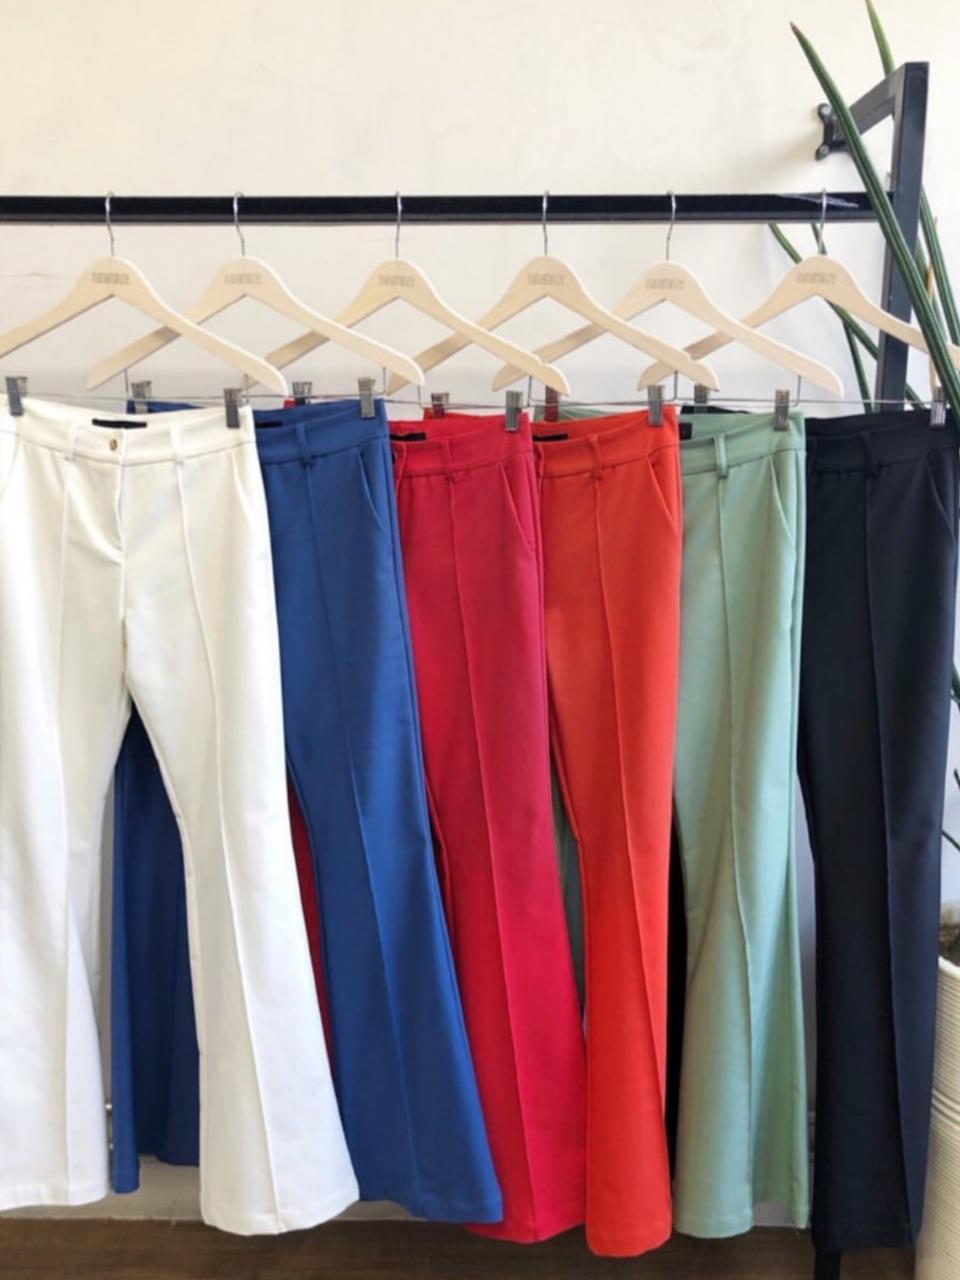 Calça Nina Flare alfaiataria 4% Elastano cores: mostarda,Nevoa,Telha,Blush , Preto e Oliva